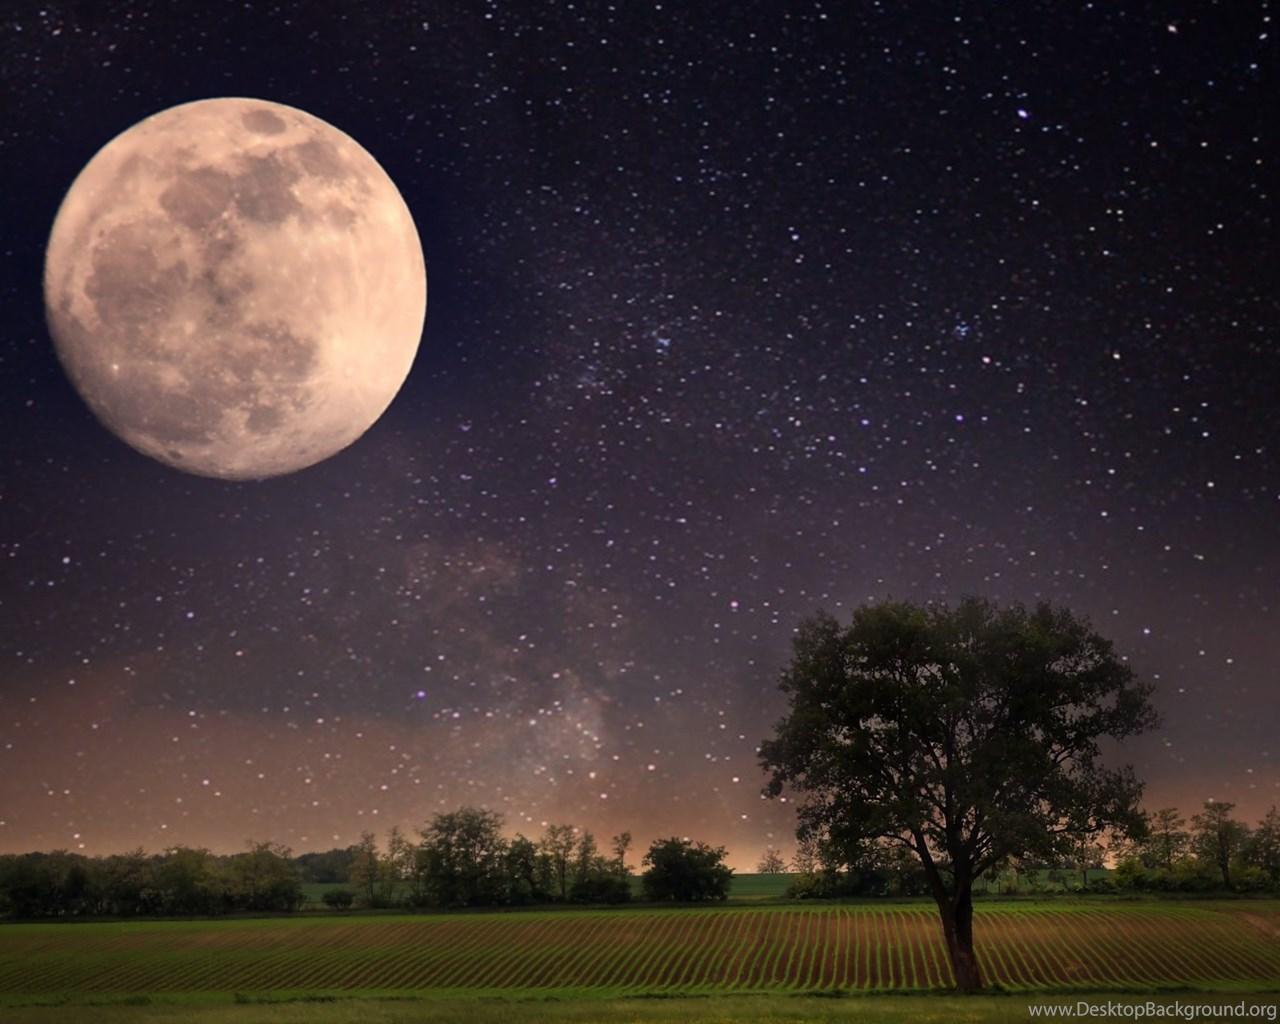 Moon night scene wallpapers 4k 4096x2160 resolution wallpapers desktop background - 4096x2160 wallpaper ...